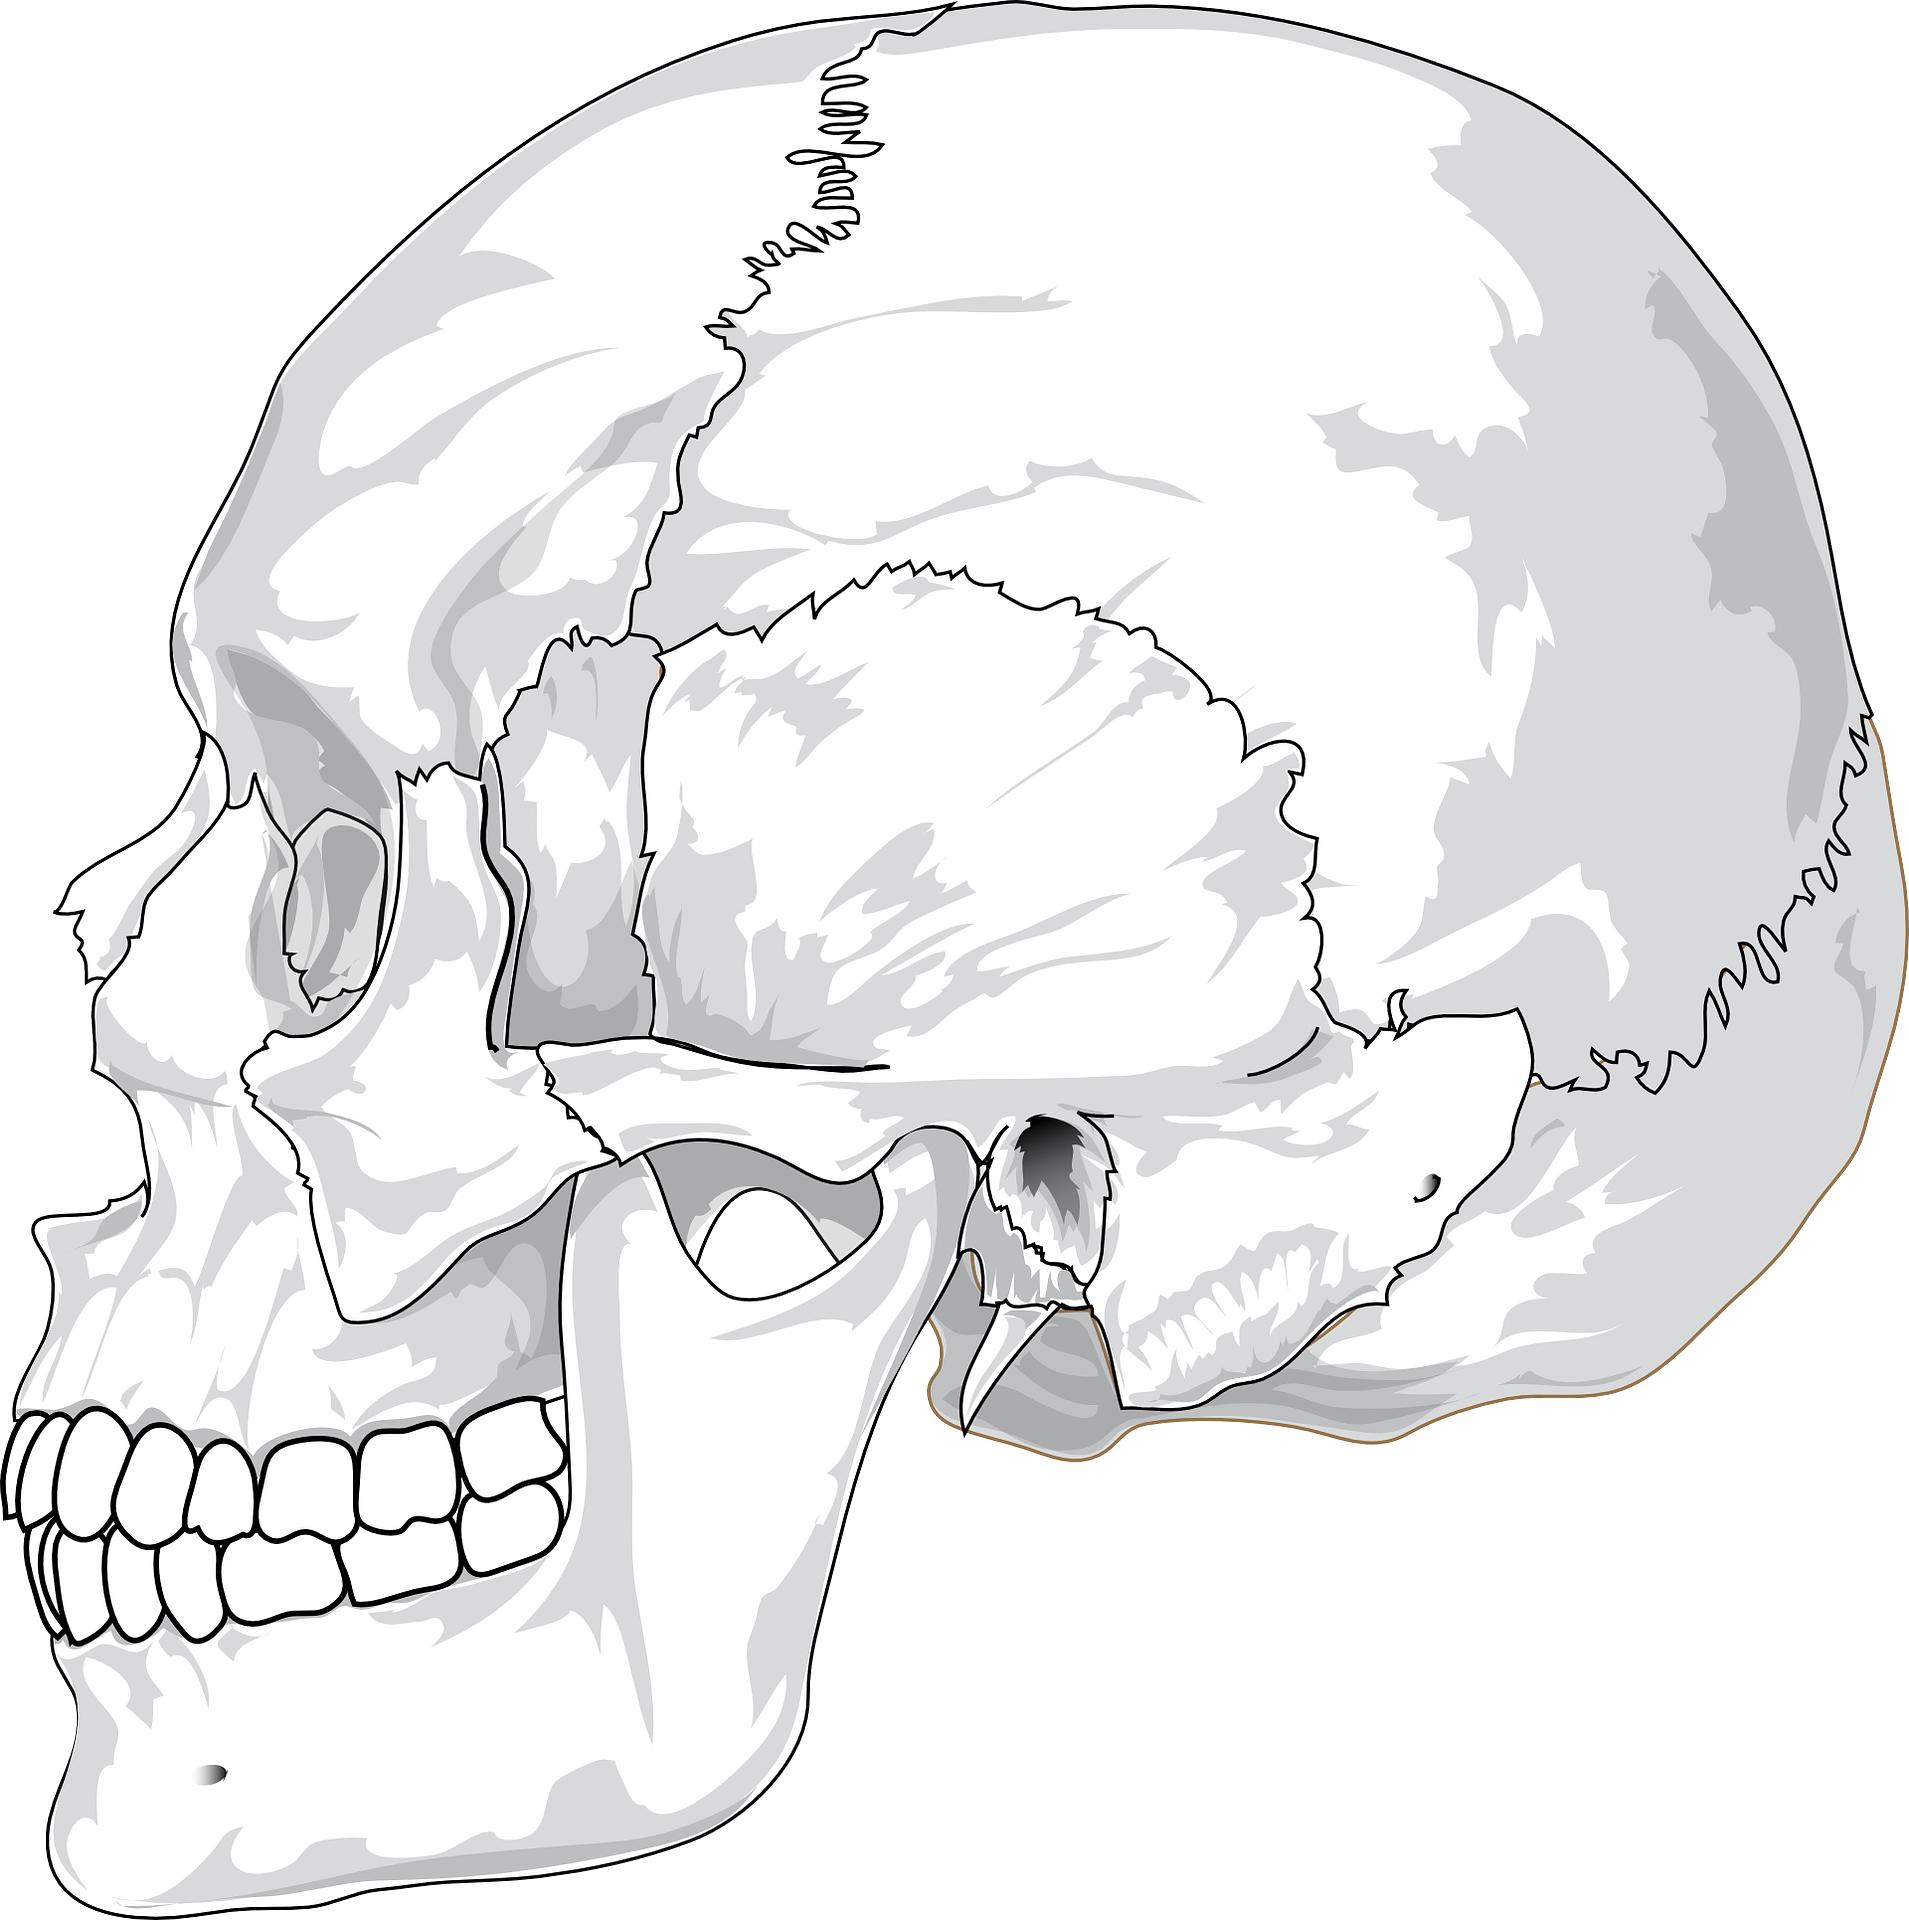 cranium vector-skull outline